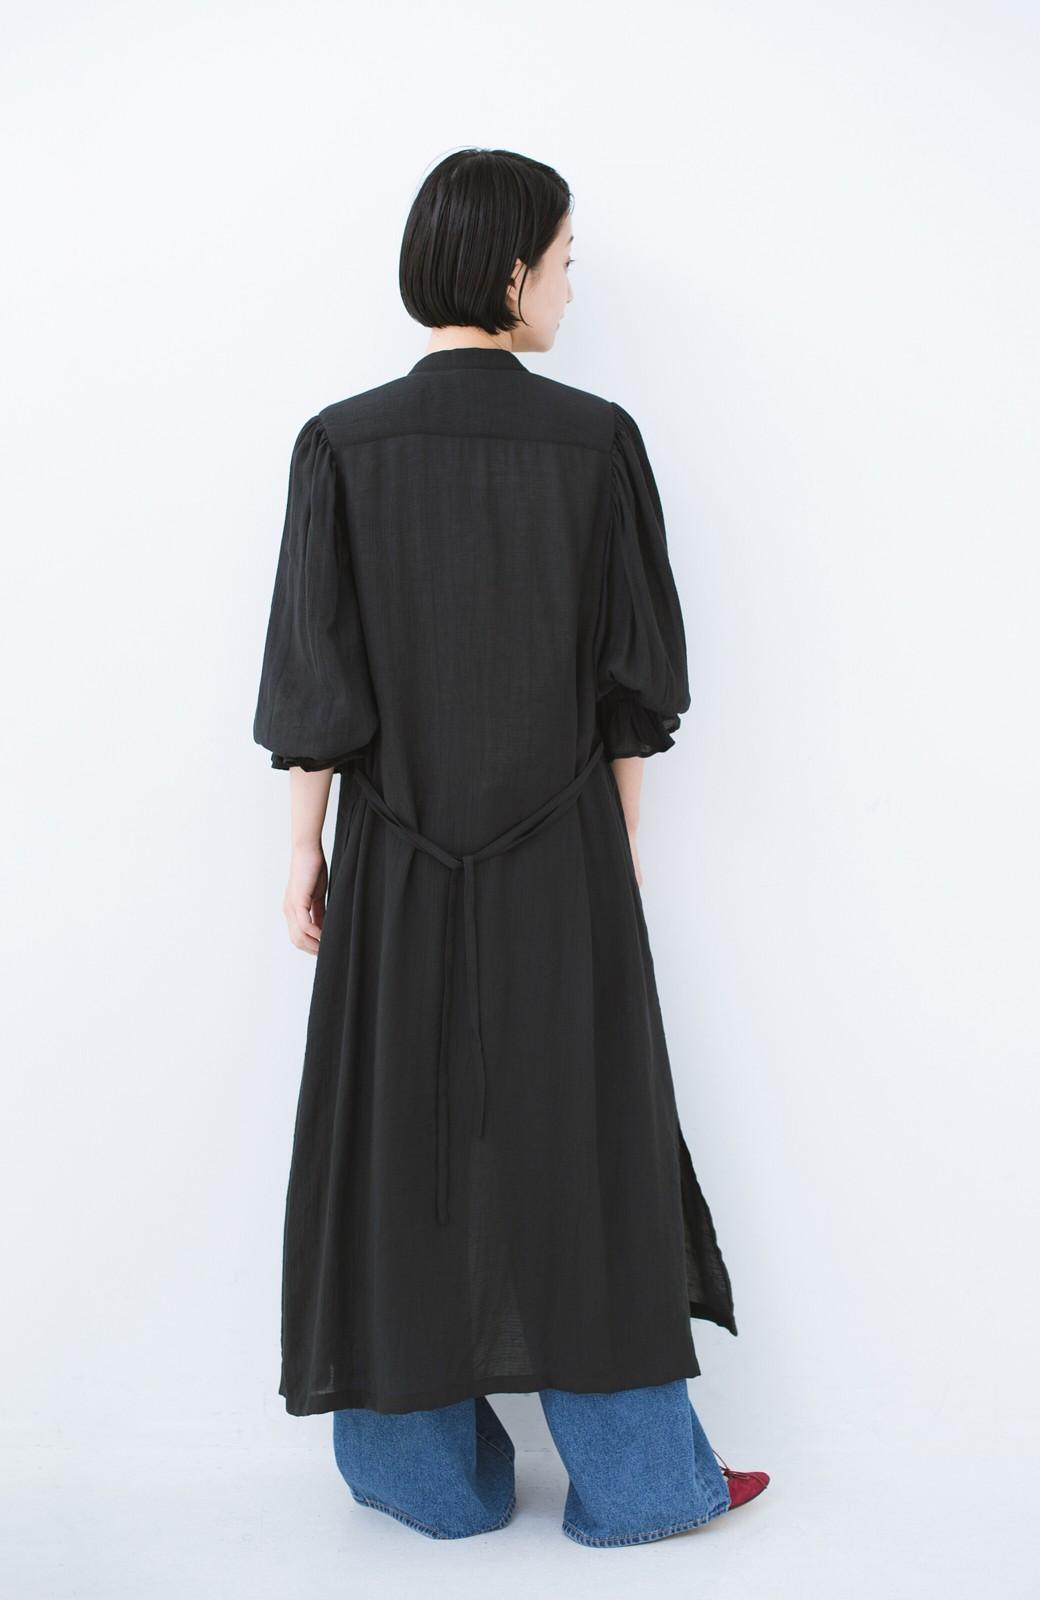 haco! 太ってもばれず 羽織っても便利なウエストリボンワンピース <ブラック>の商品写真15